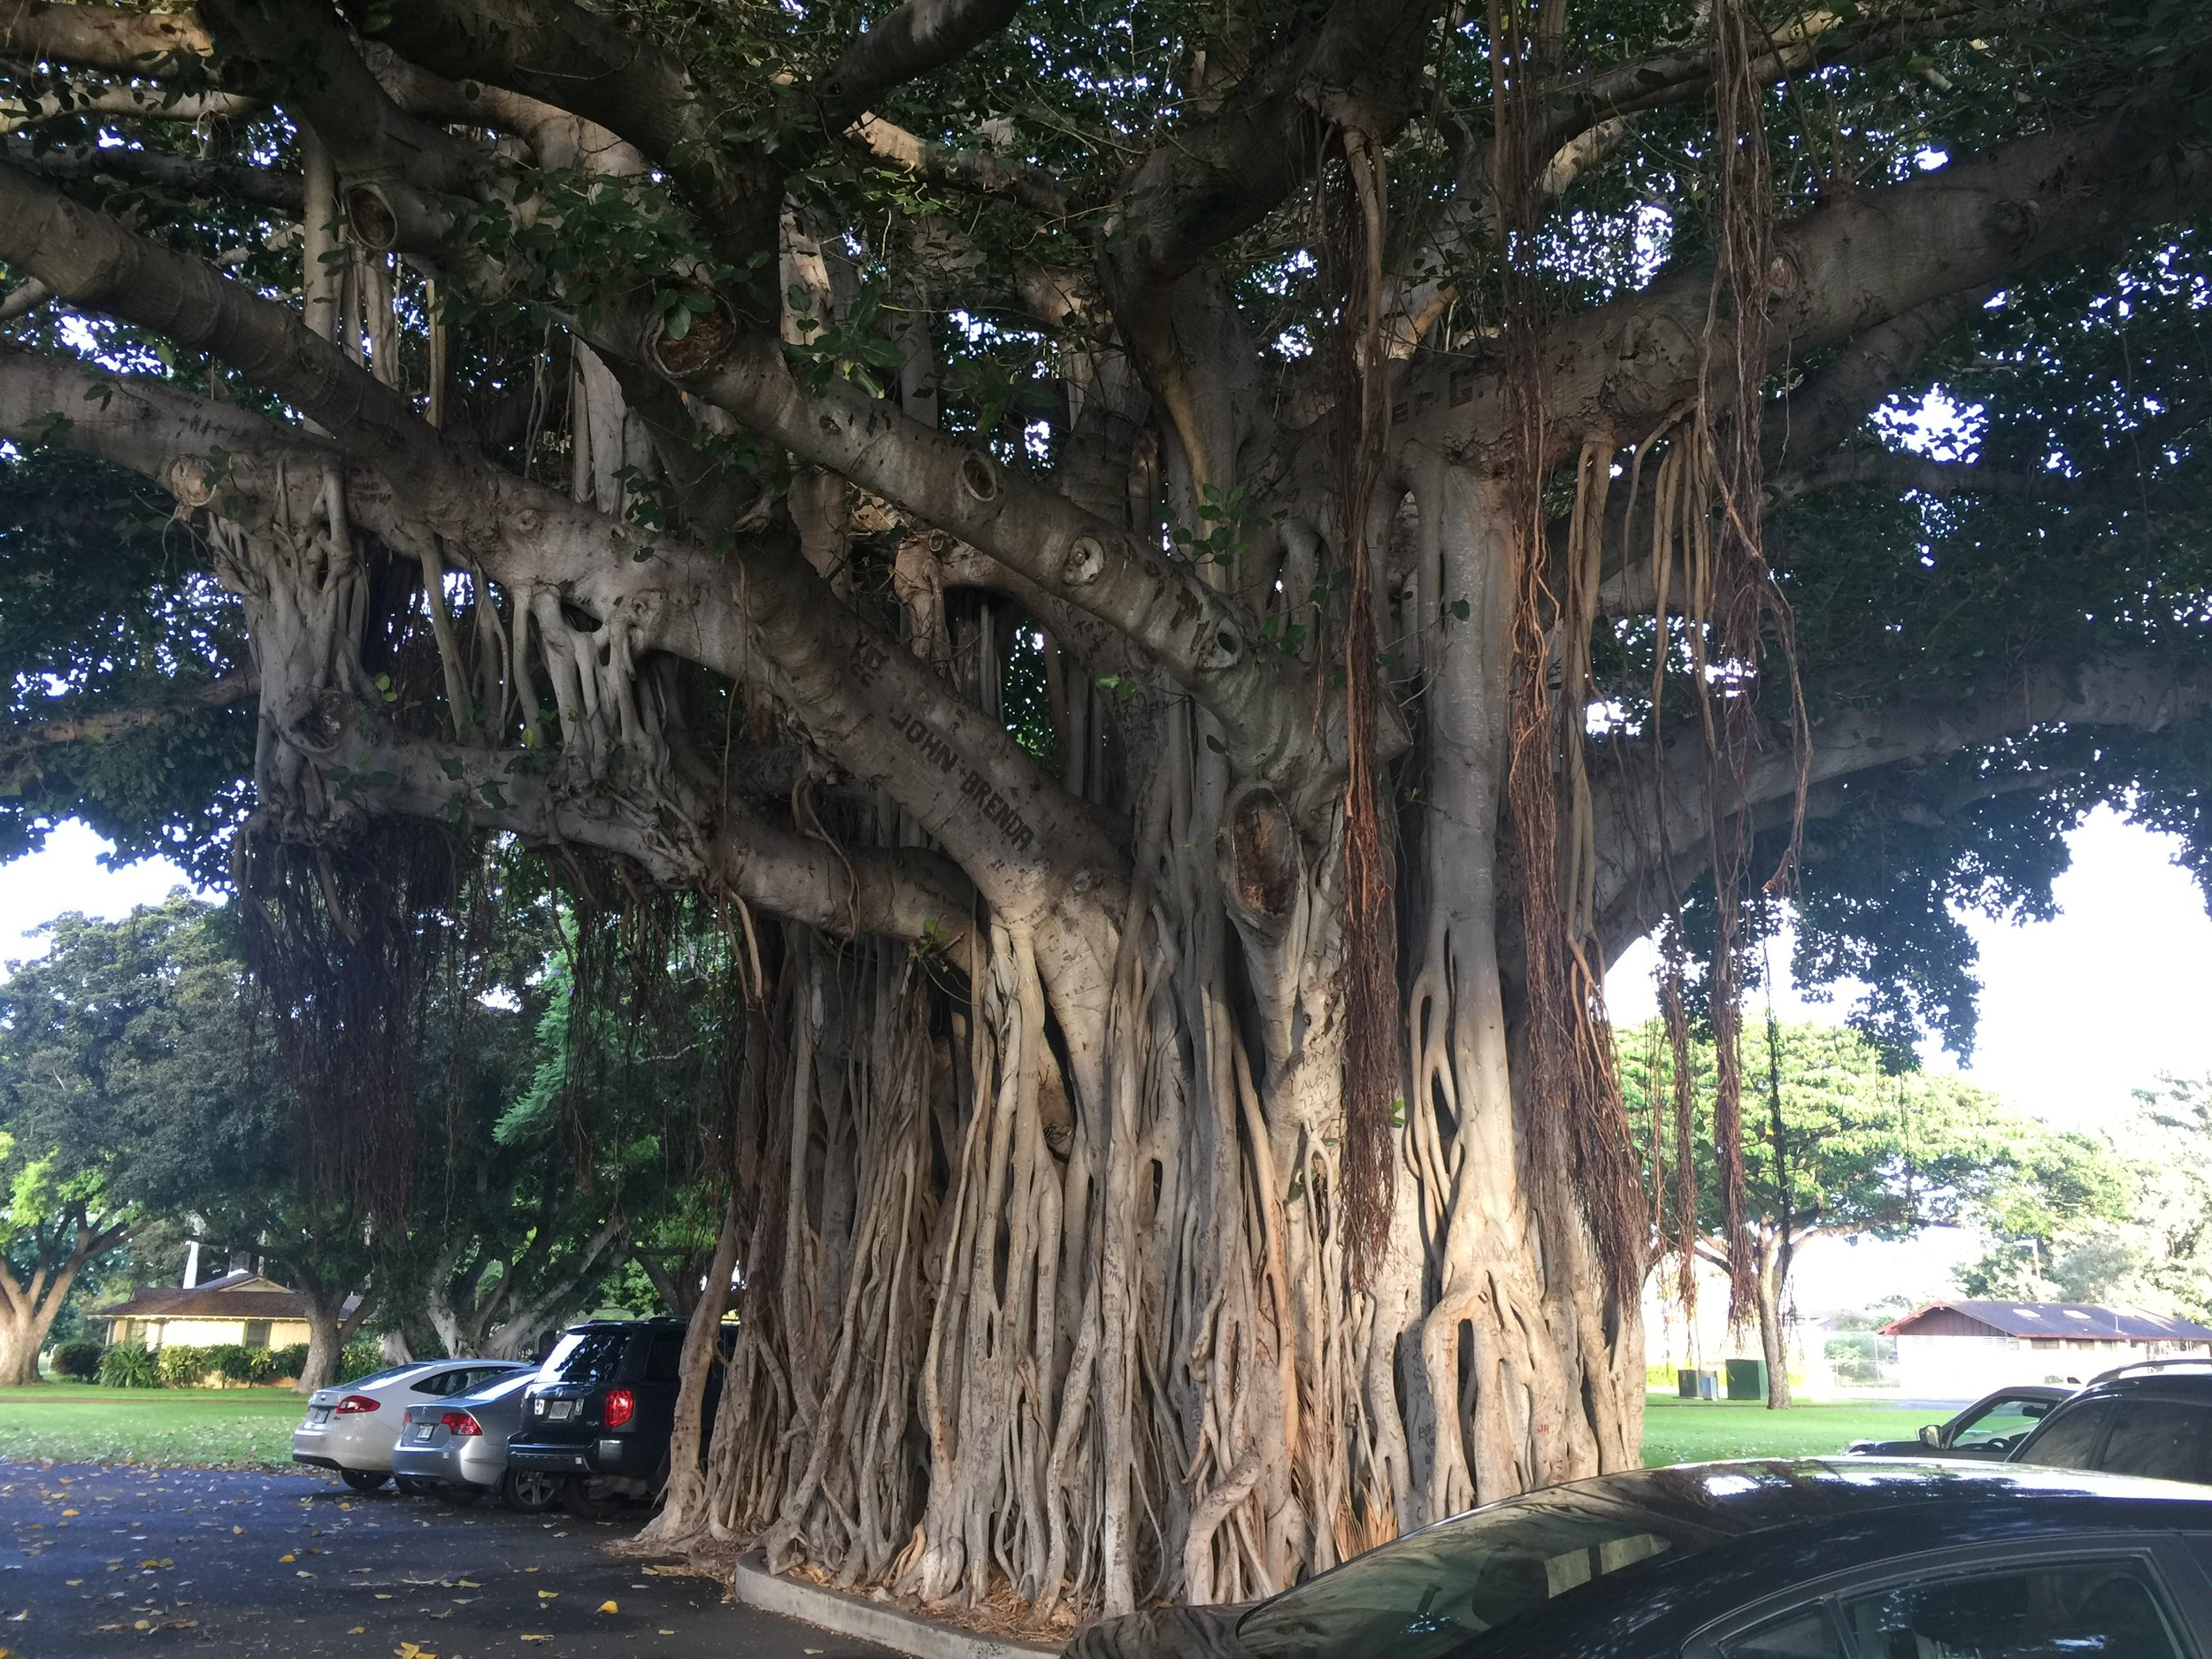 Banyan Tree, Langley Ave, Ford Island